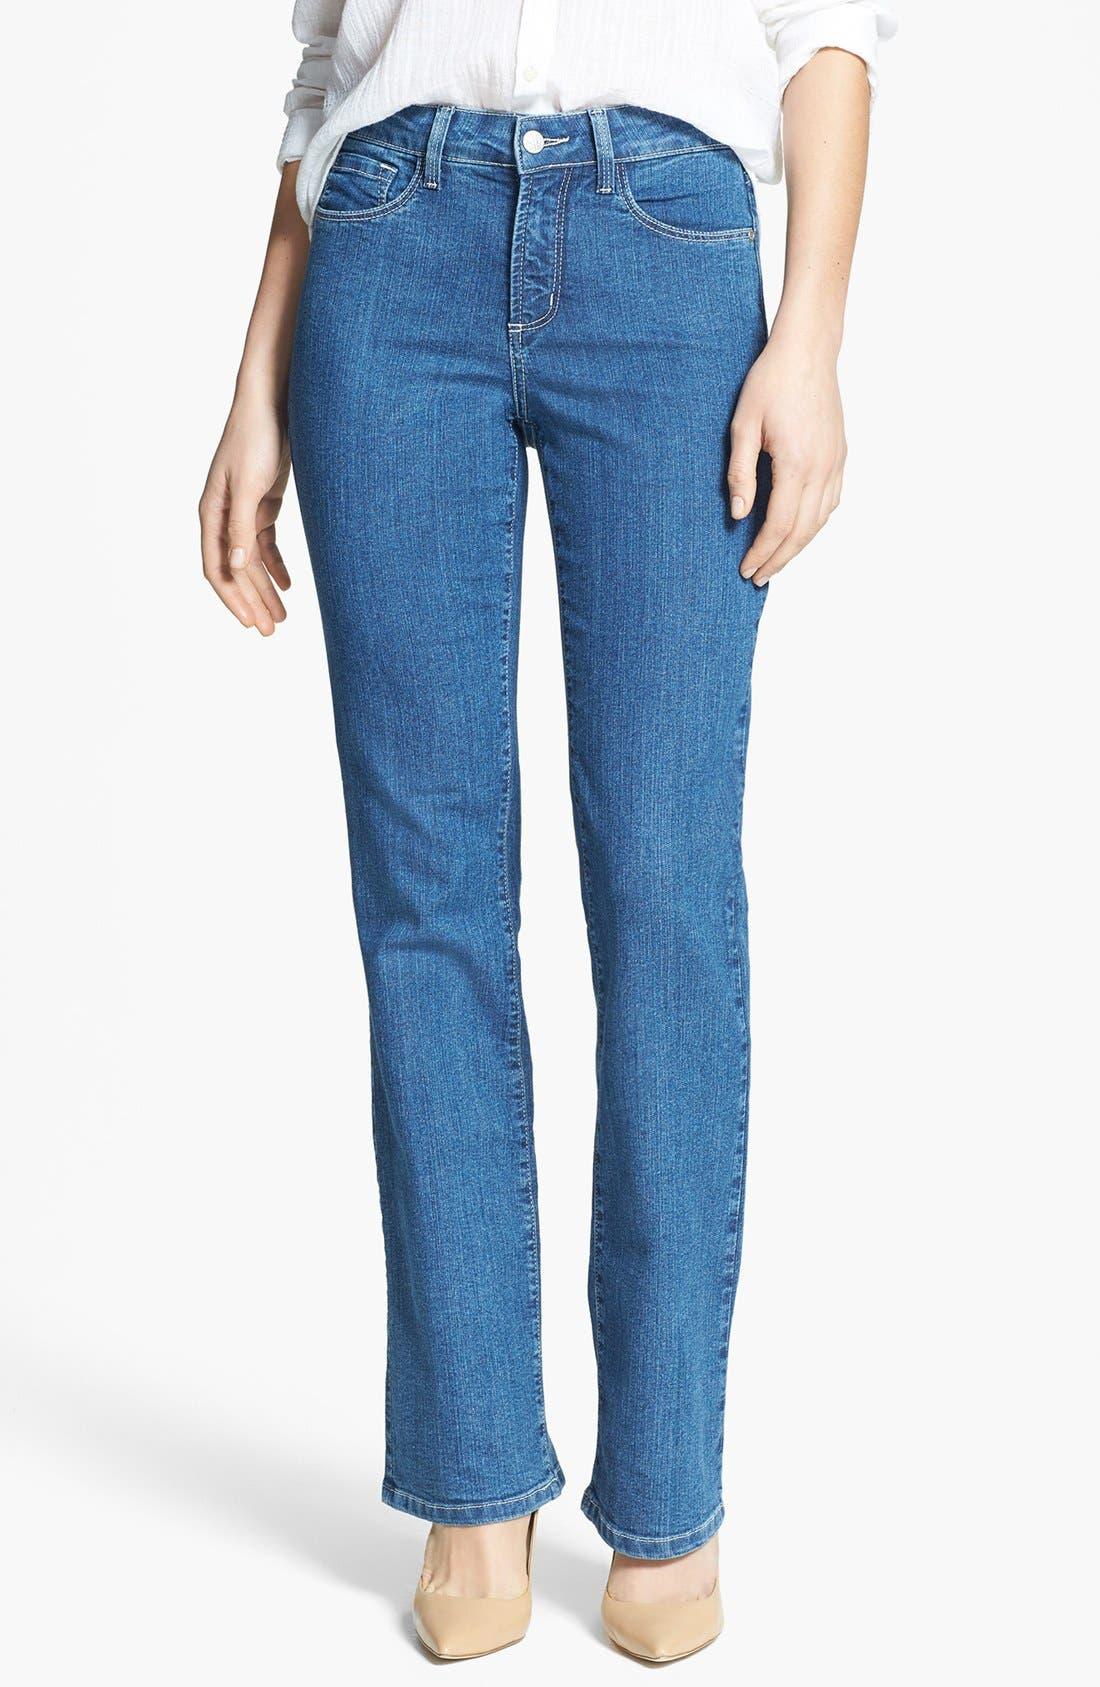 Main Image - NYDJ 'Barbara' Embellished Pocket Stretch Bootcut Jeans (Maryland)